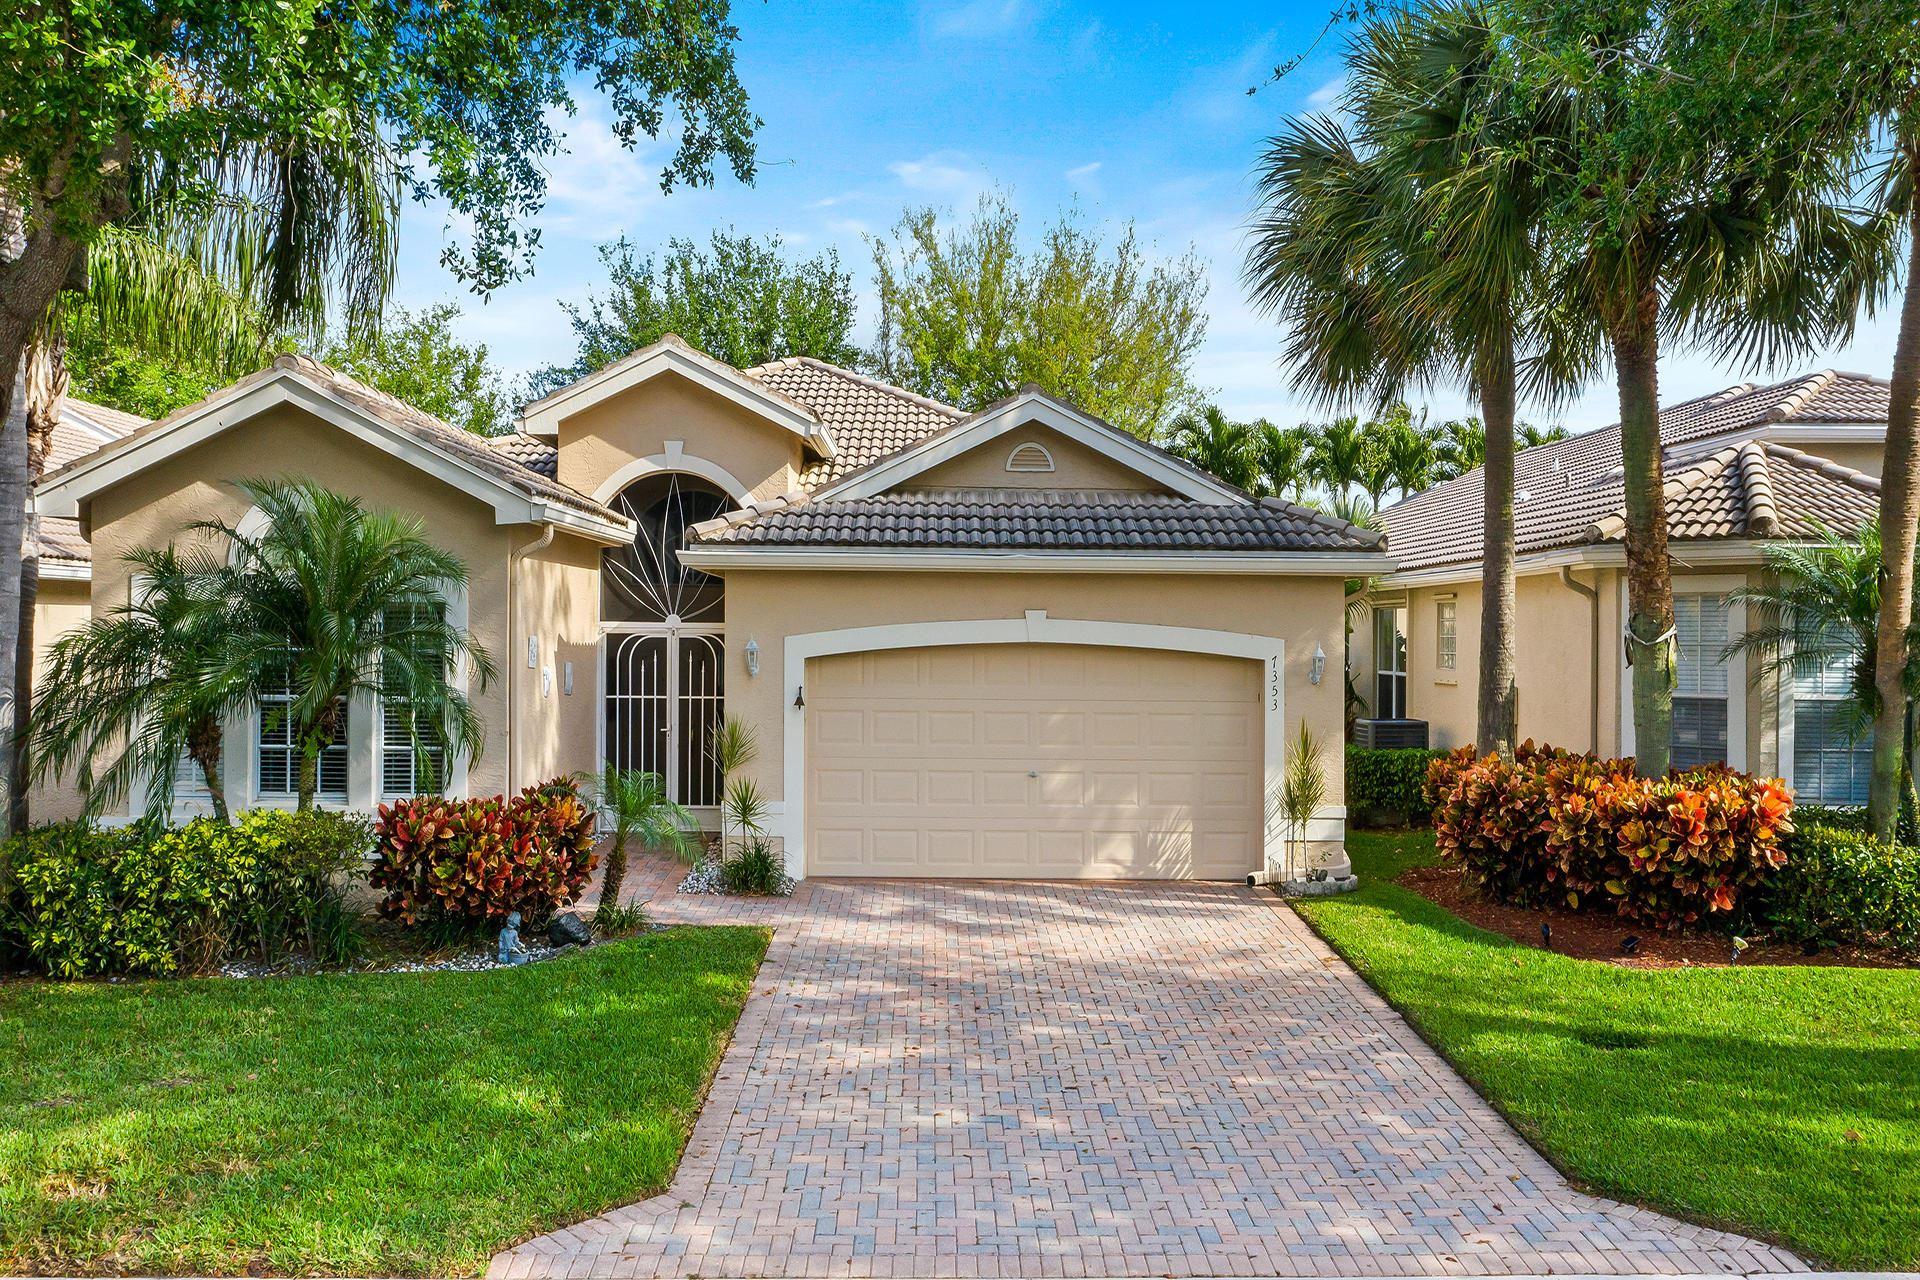 7353 Kea Lani Drive, Boynton Beach, FL 33437 - MLS#: RX-10700593